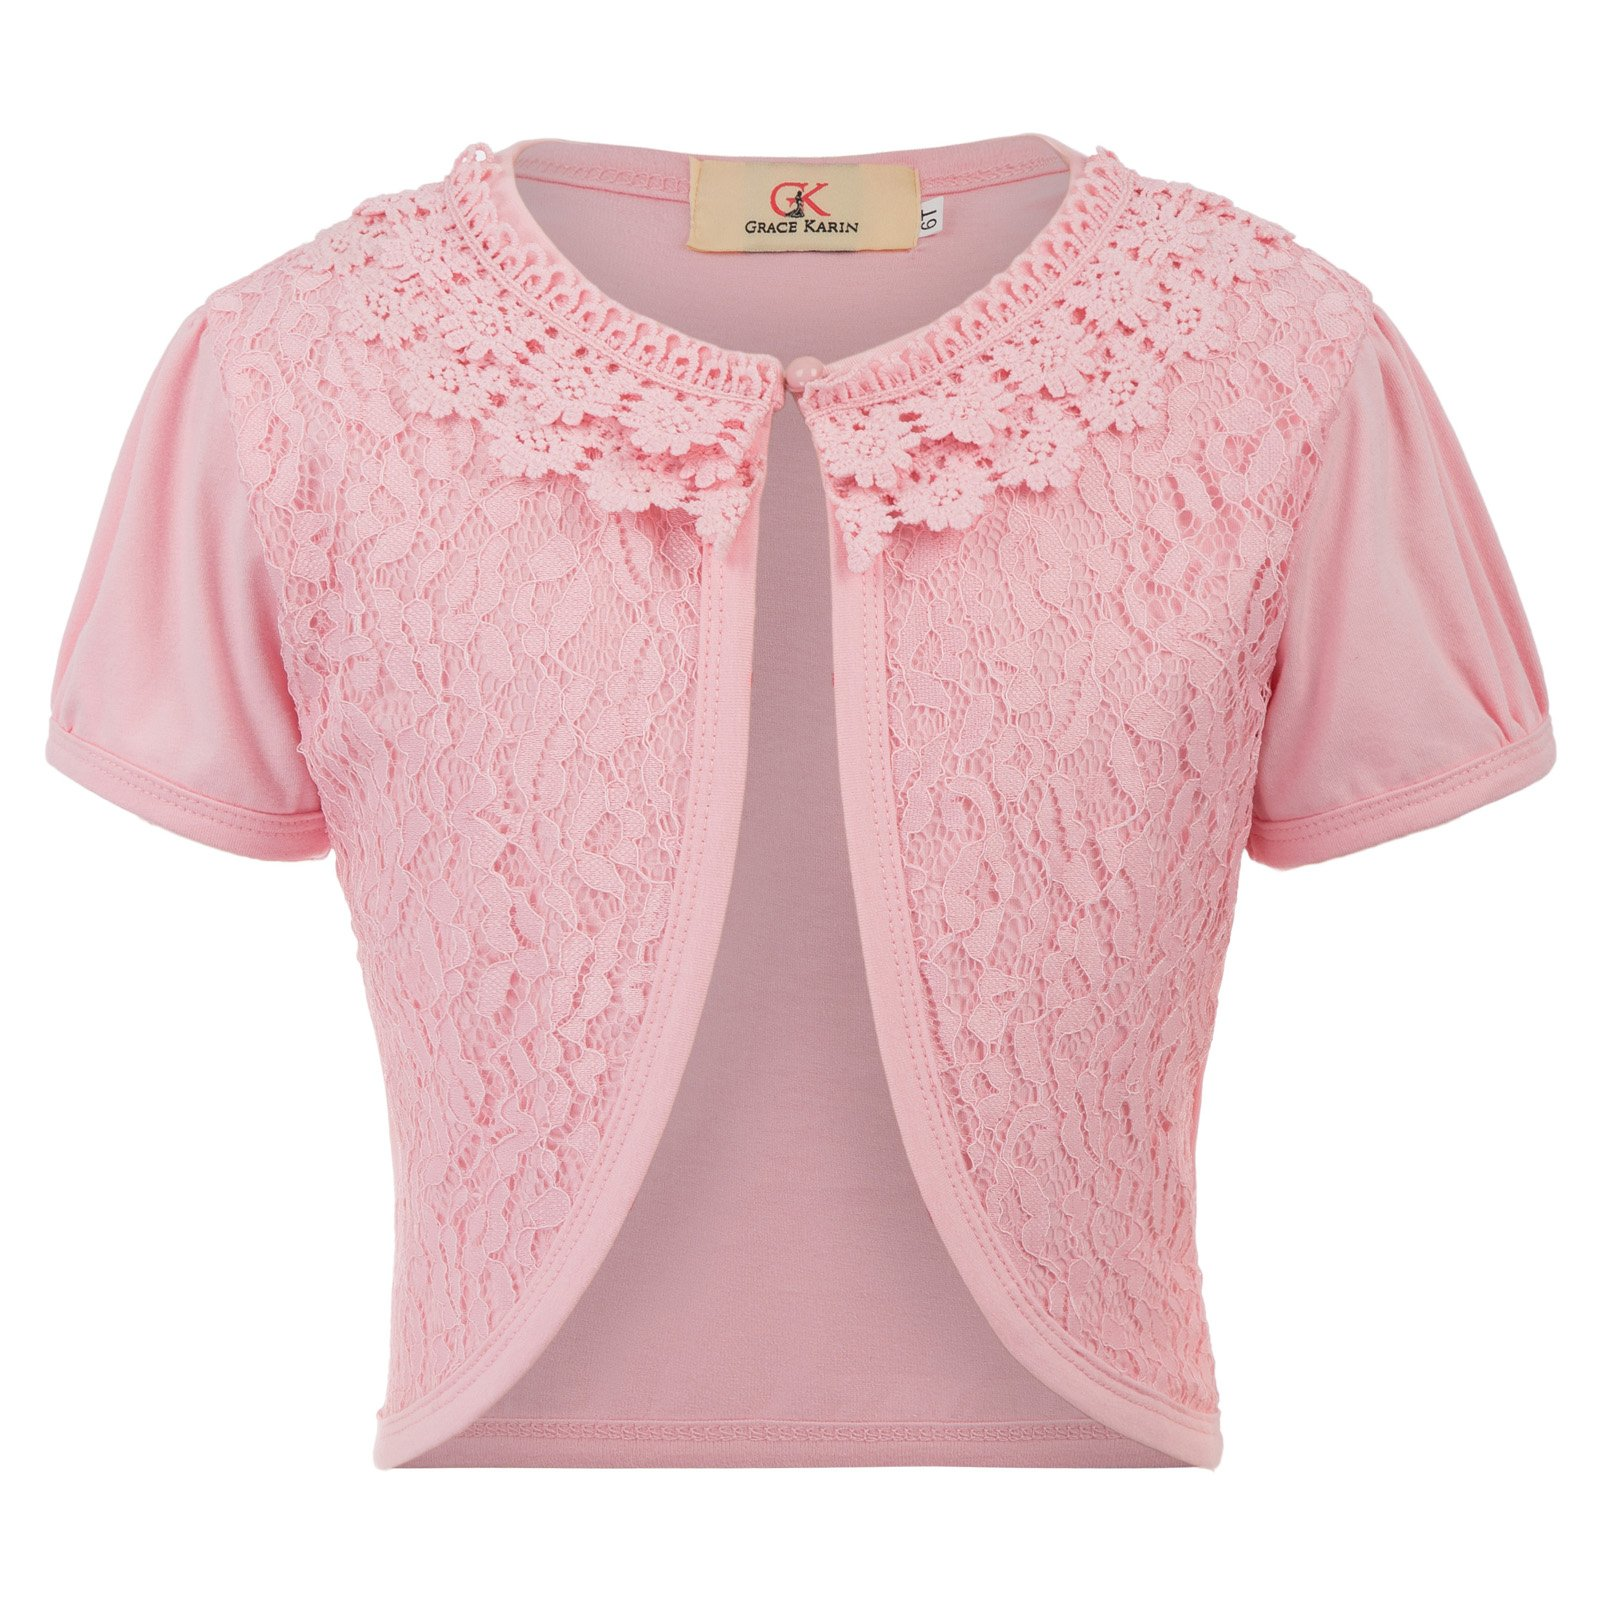 GRACE KARIN Little Girls' Short Sleeve Sweater Cardigan Diamond Knit Bolero Shrug 7T CL774-1